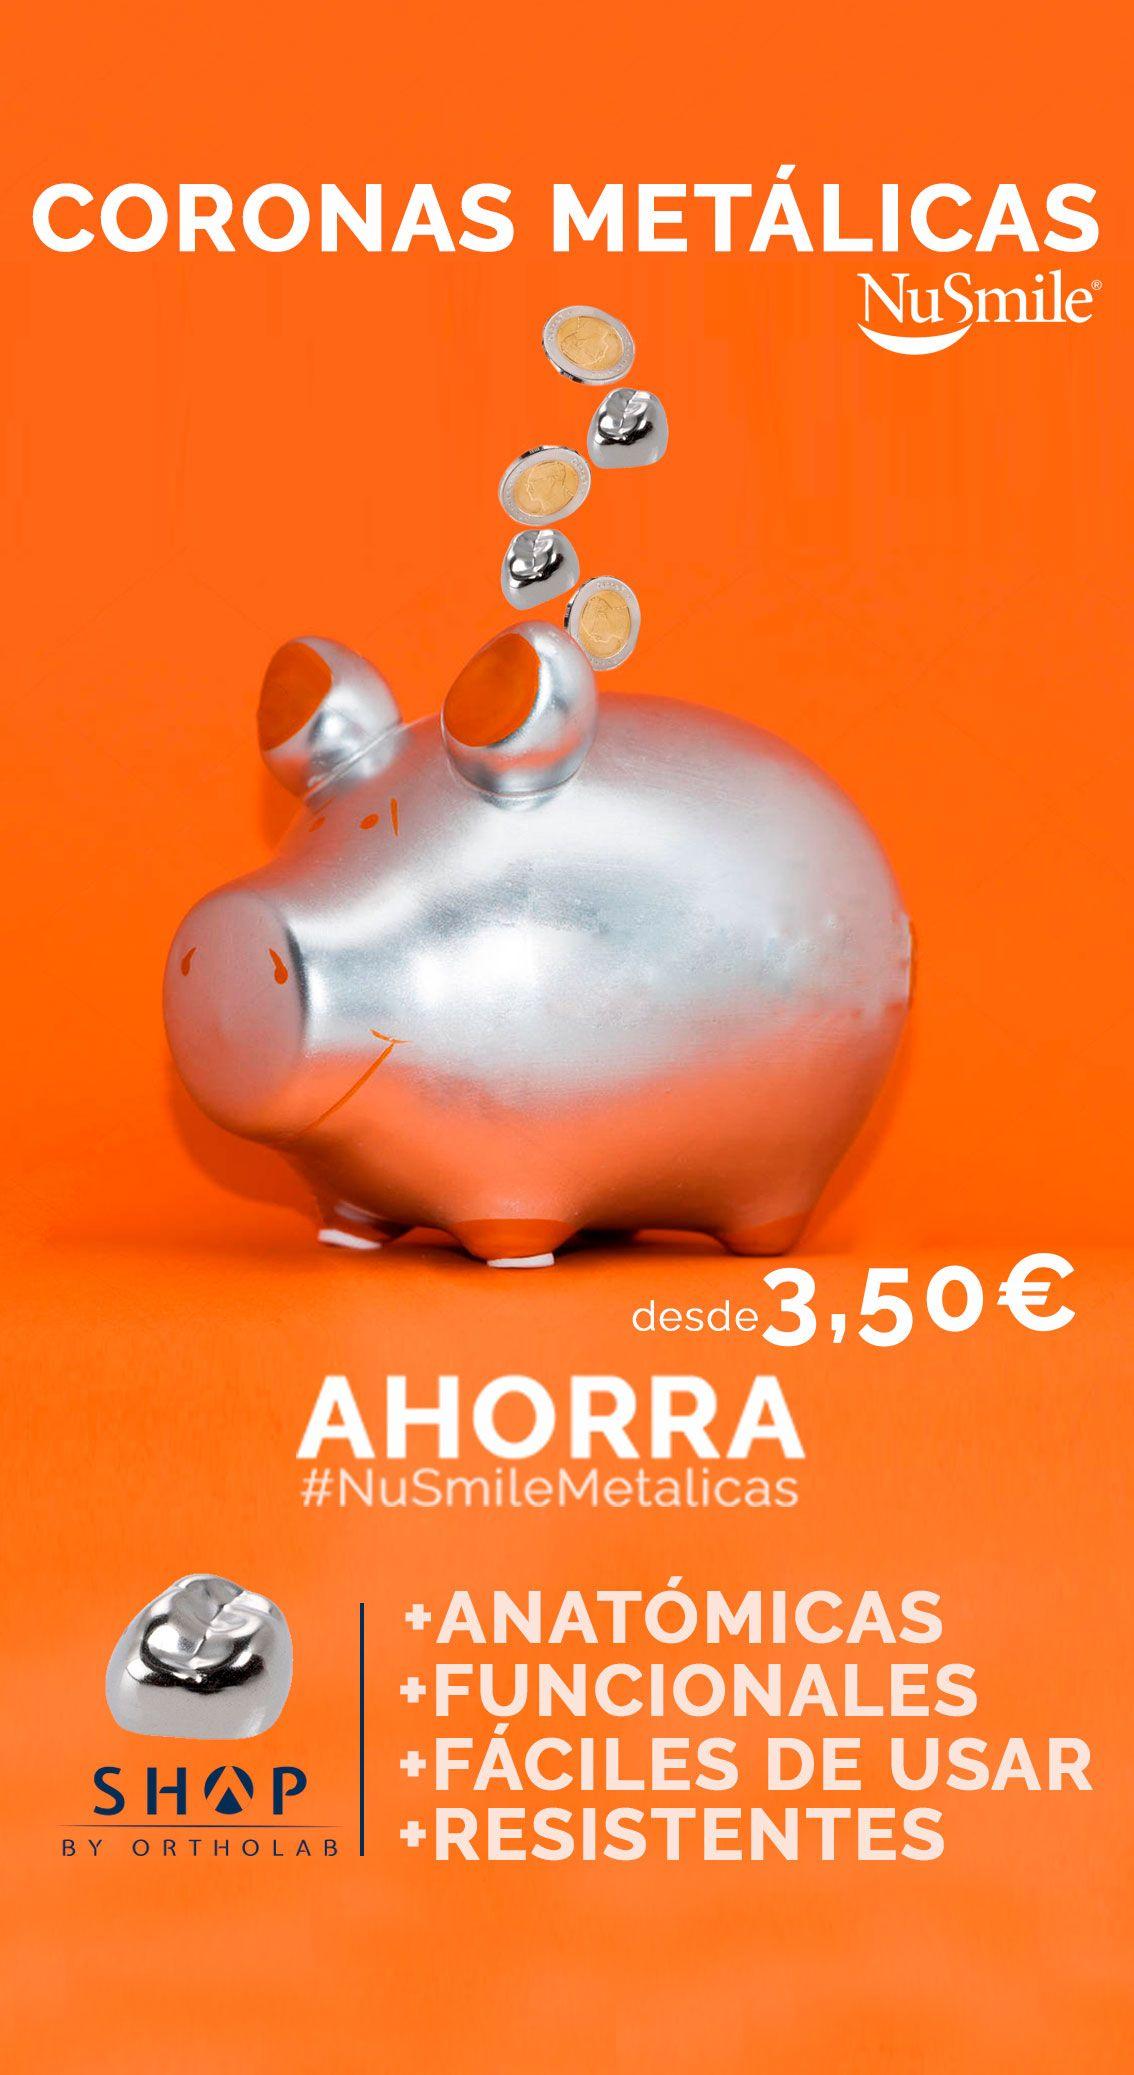 Coronas metalicas NuSmile Exclusiva Shop by OrthoLab